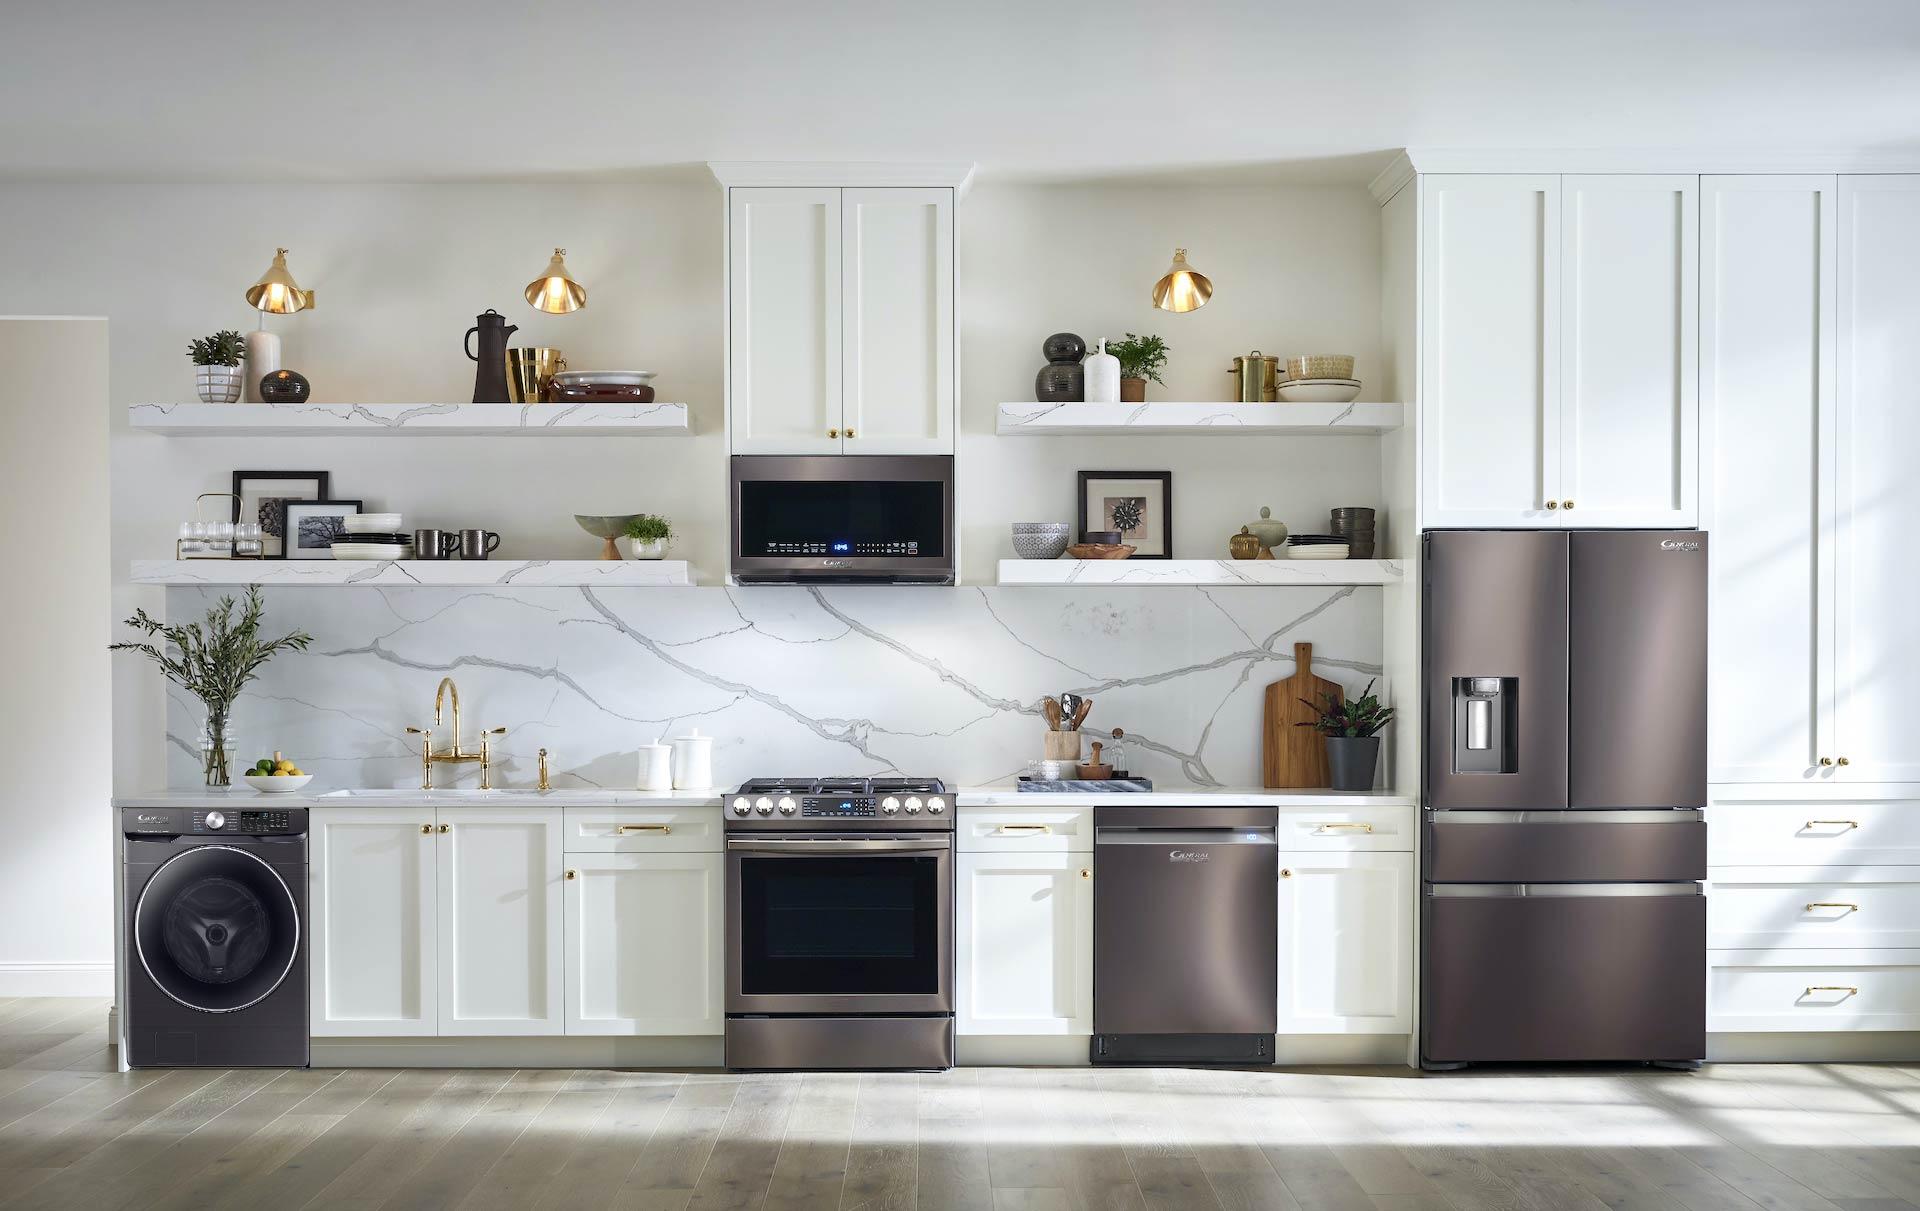 Kitchen-Space-Wallpaper